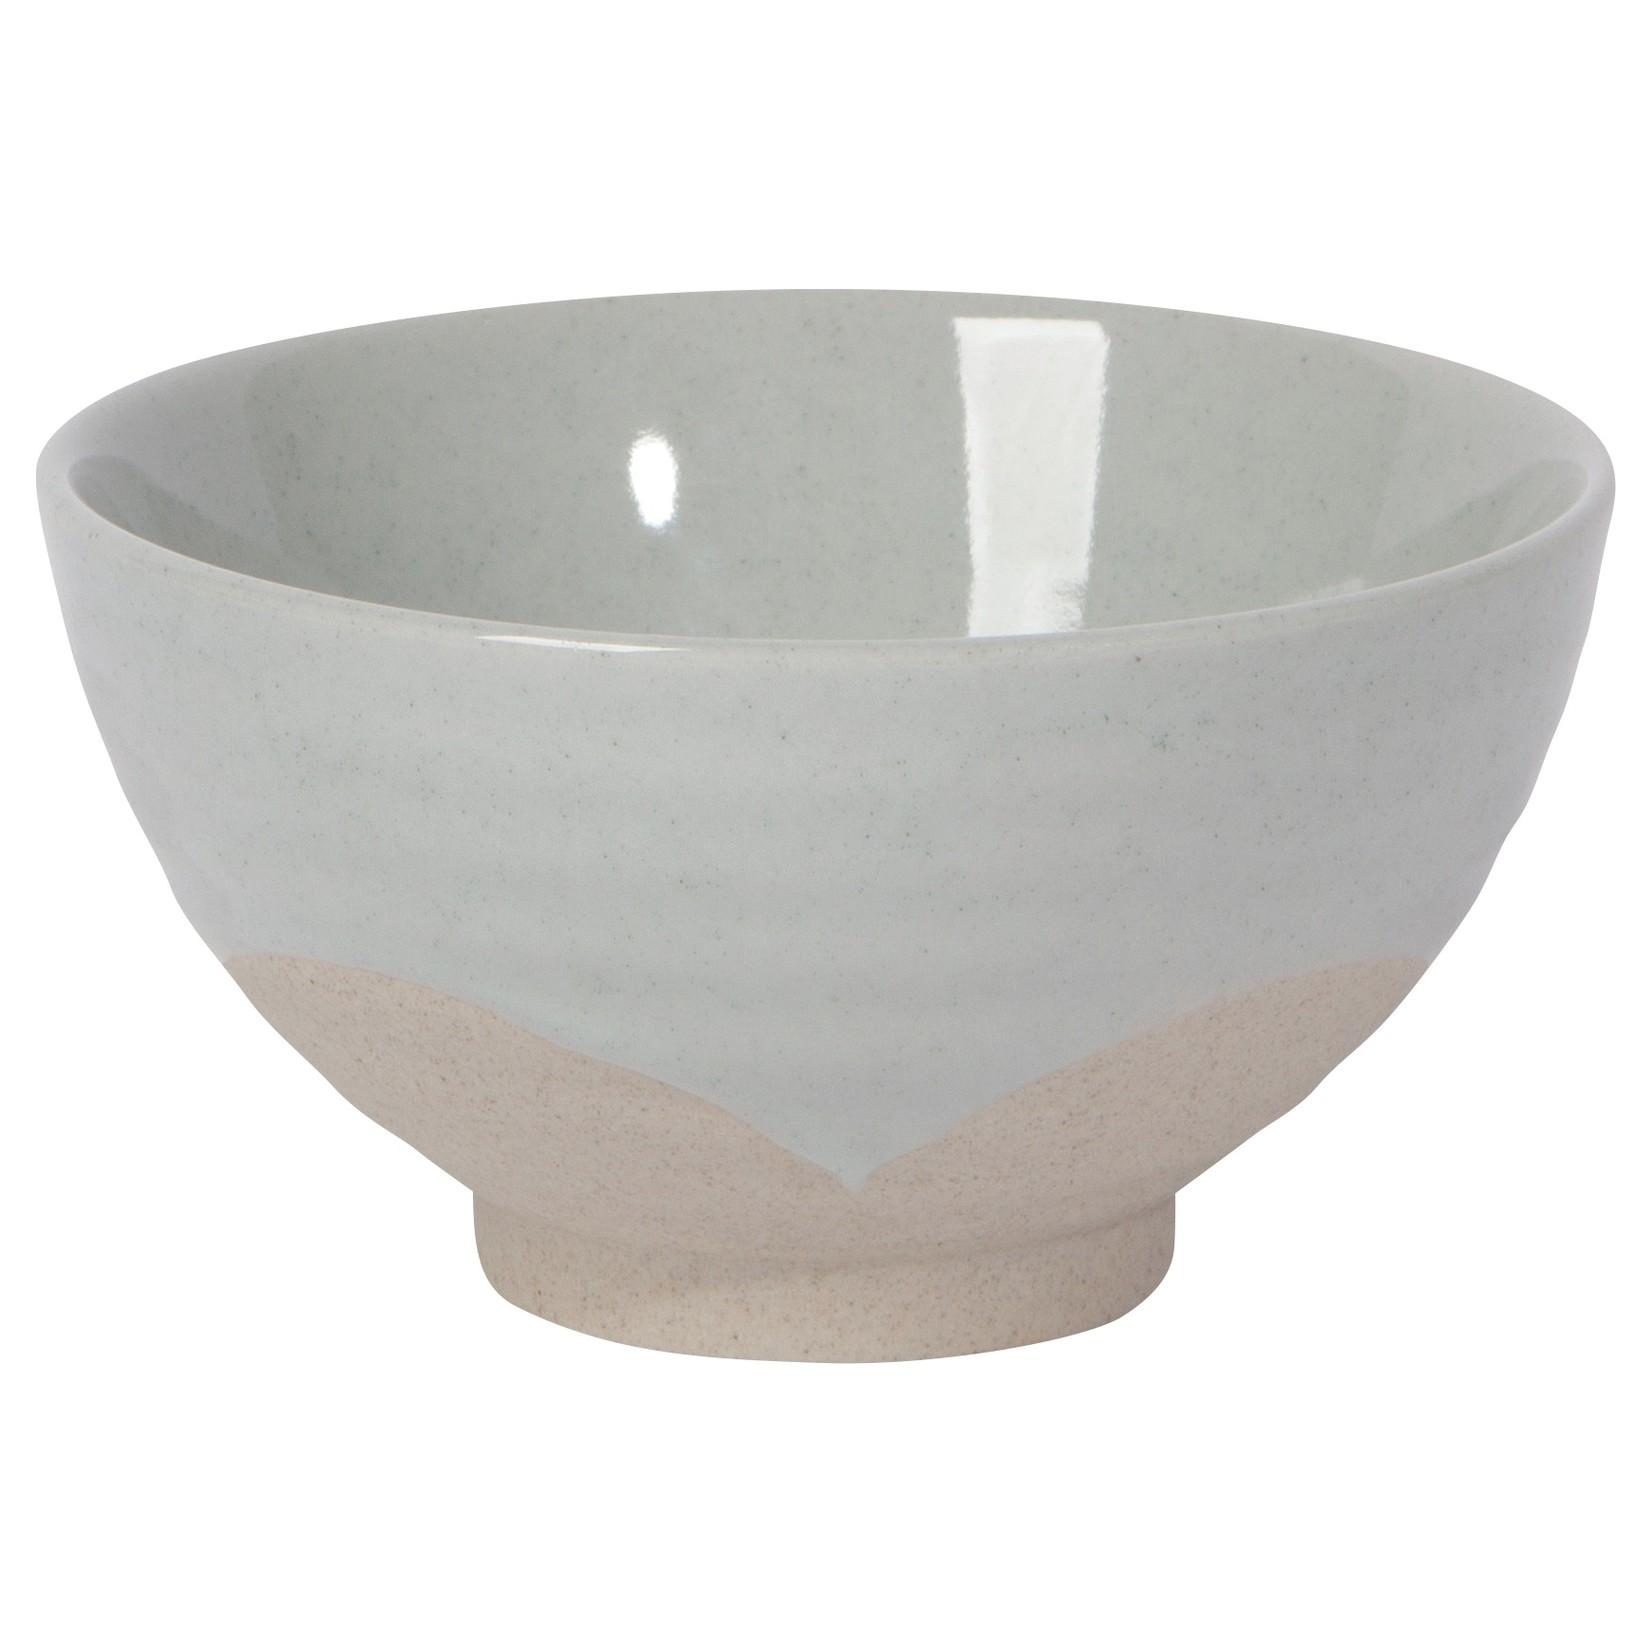 "Heirloom Element Bowl - 4.75"""